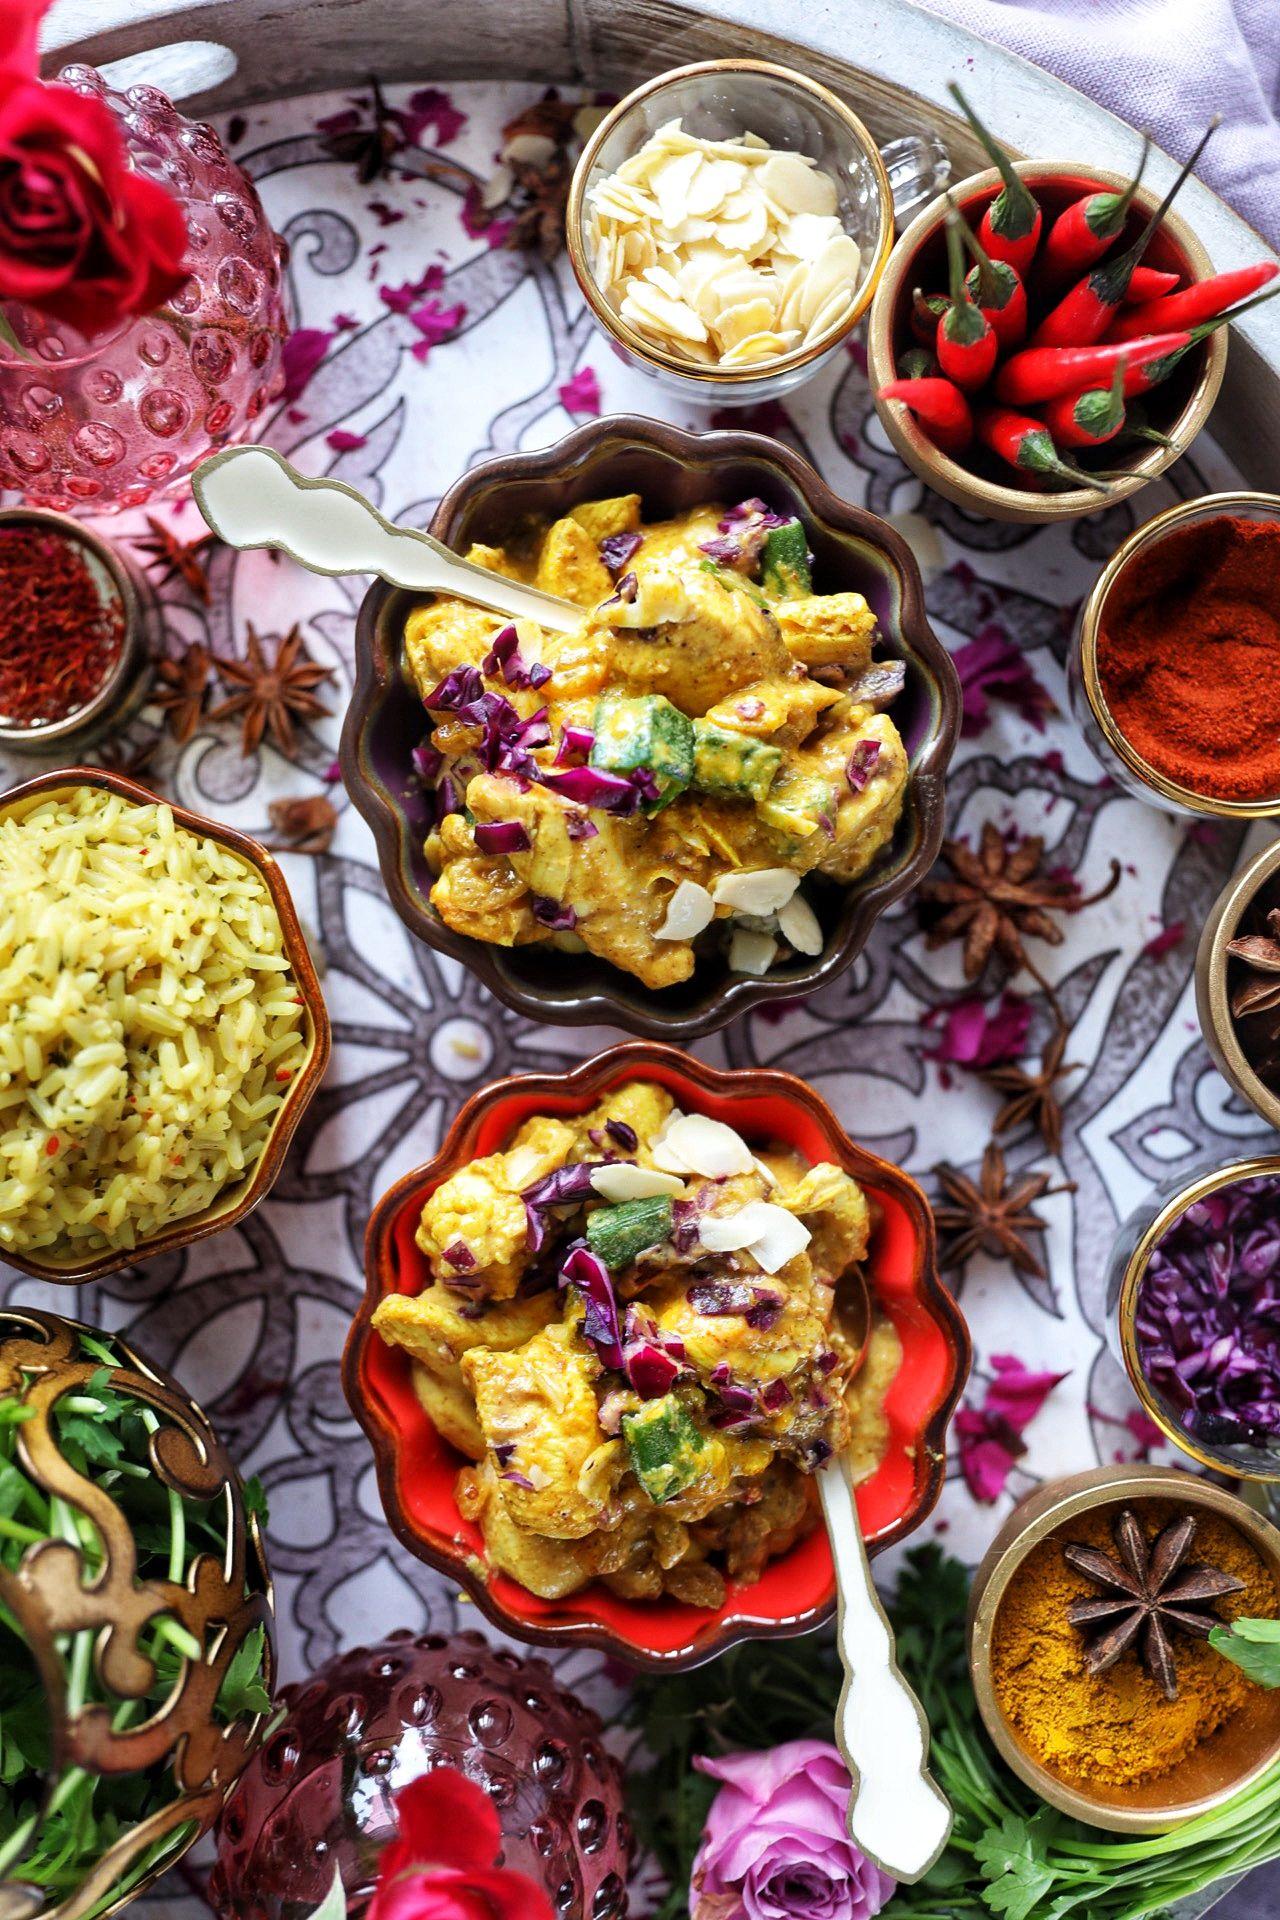 Patak S 3 Step Chicken Korma Medley With Almonds Golden Raisins Recipe Chicken Korma Korma Golden Raisins